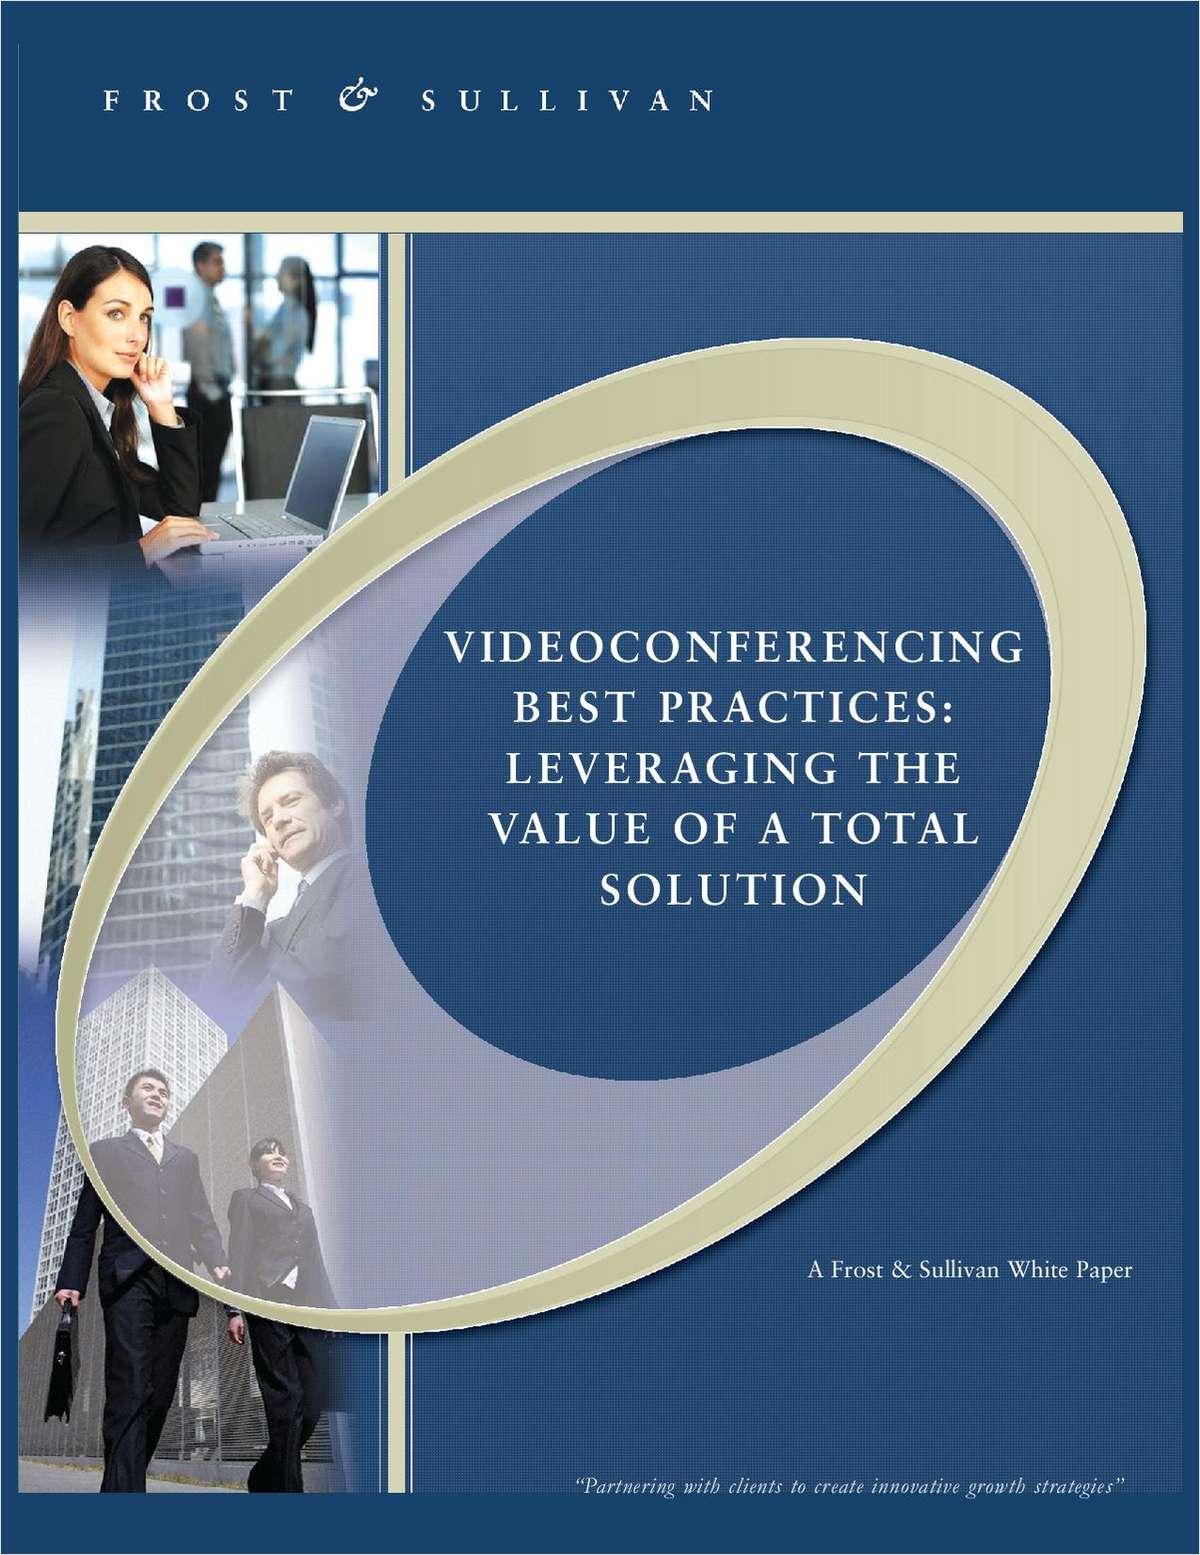 Video Conferencing Best Practices